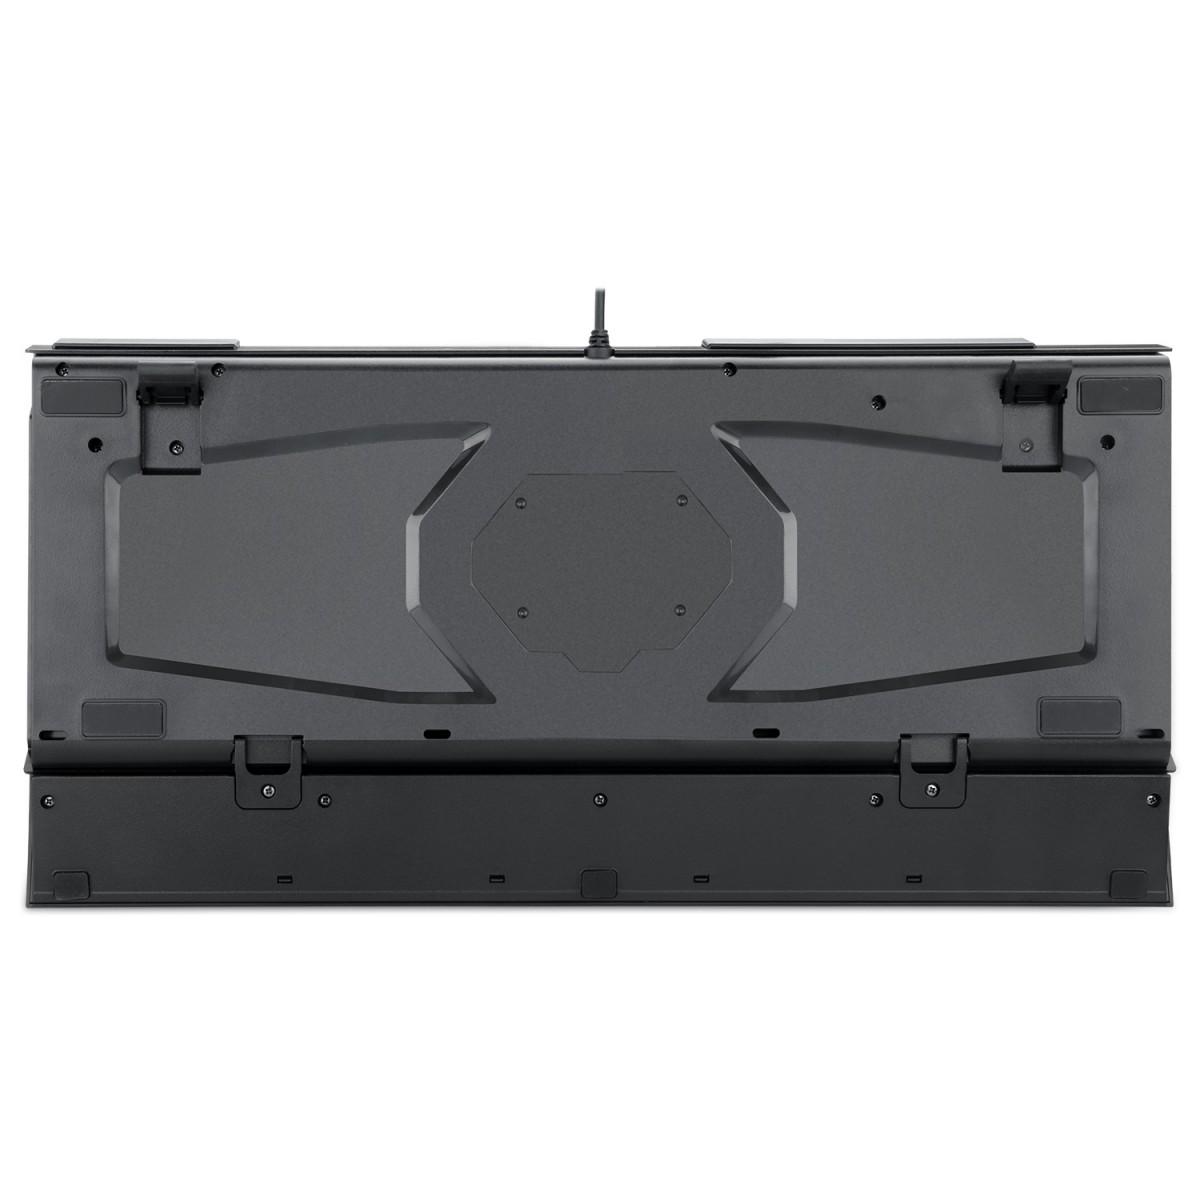 Teclado Mecânico Gamer Redragon Surya  2 K563RGB-1, Switch Outemu Blue, Black